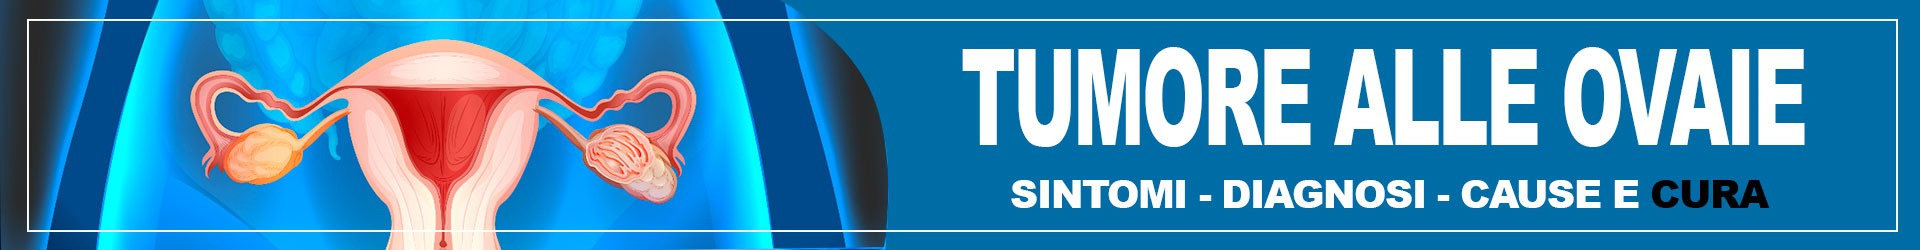 tumore-alle-ovaie-sintomi-diagnosi-cause-e-cura